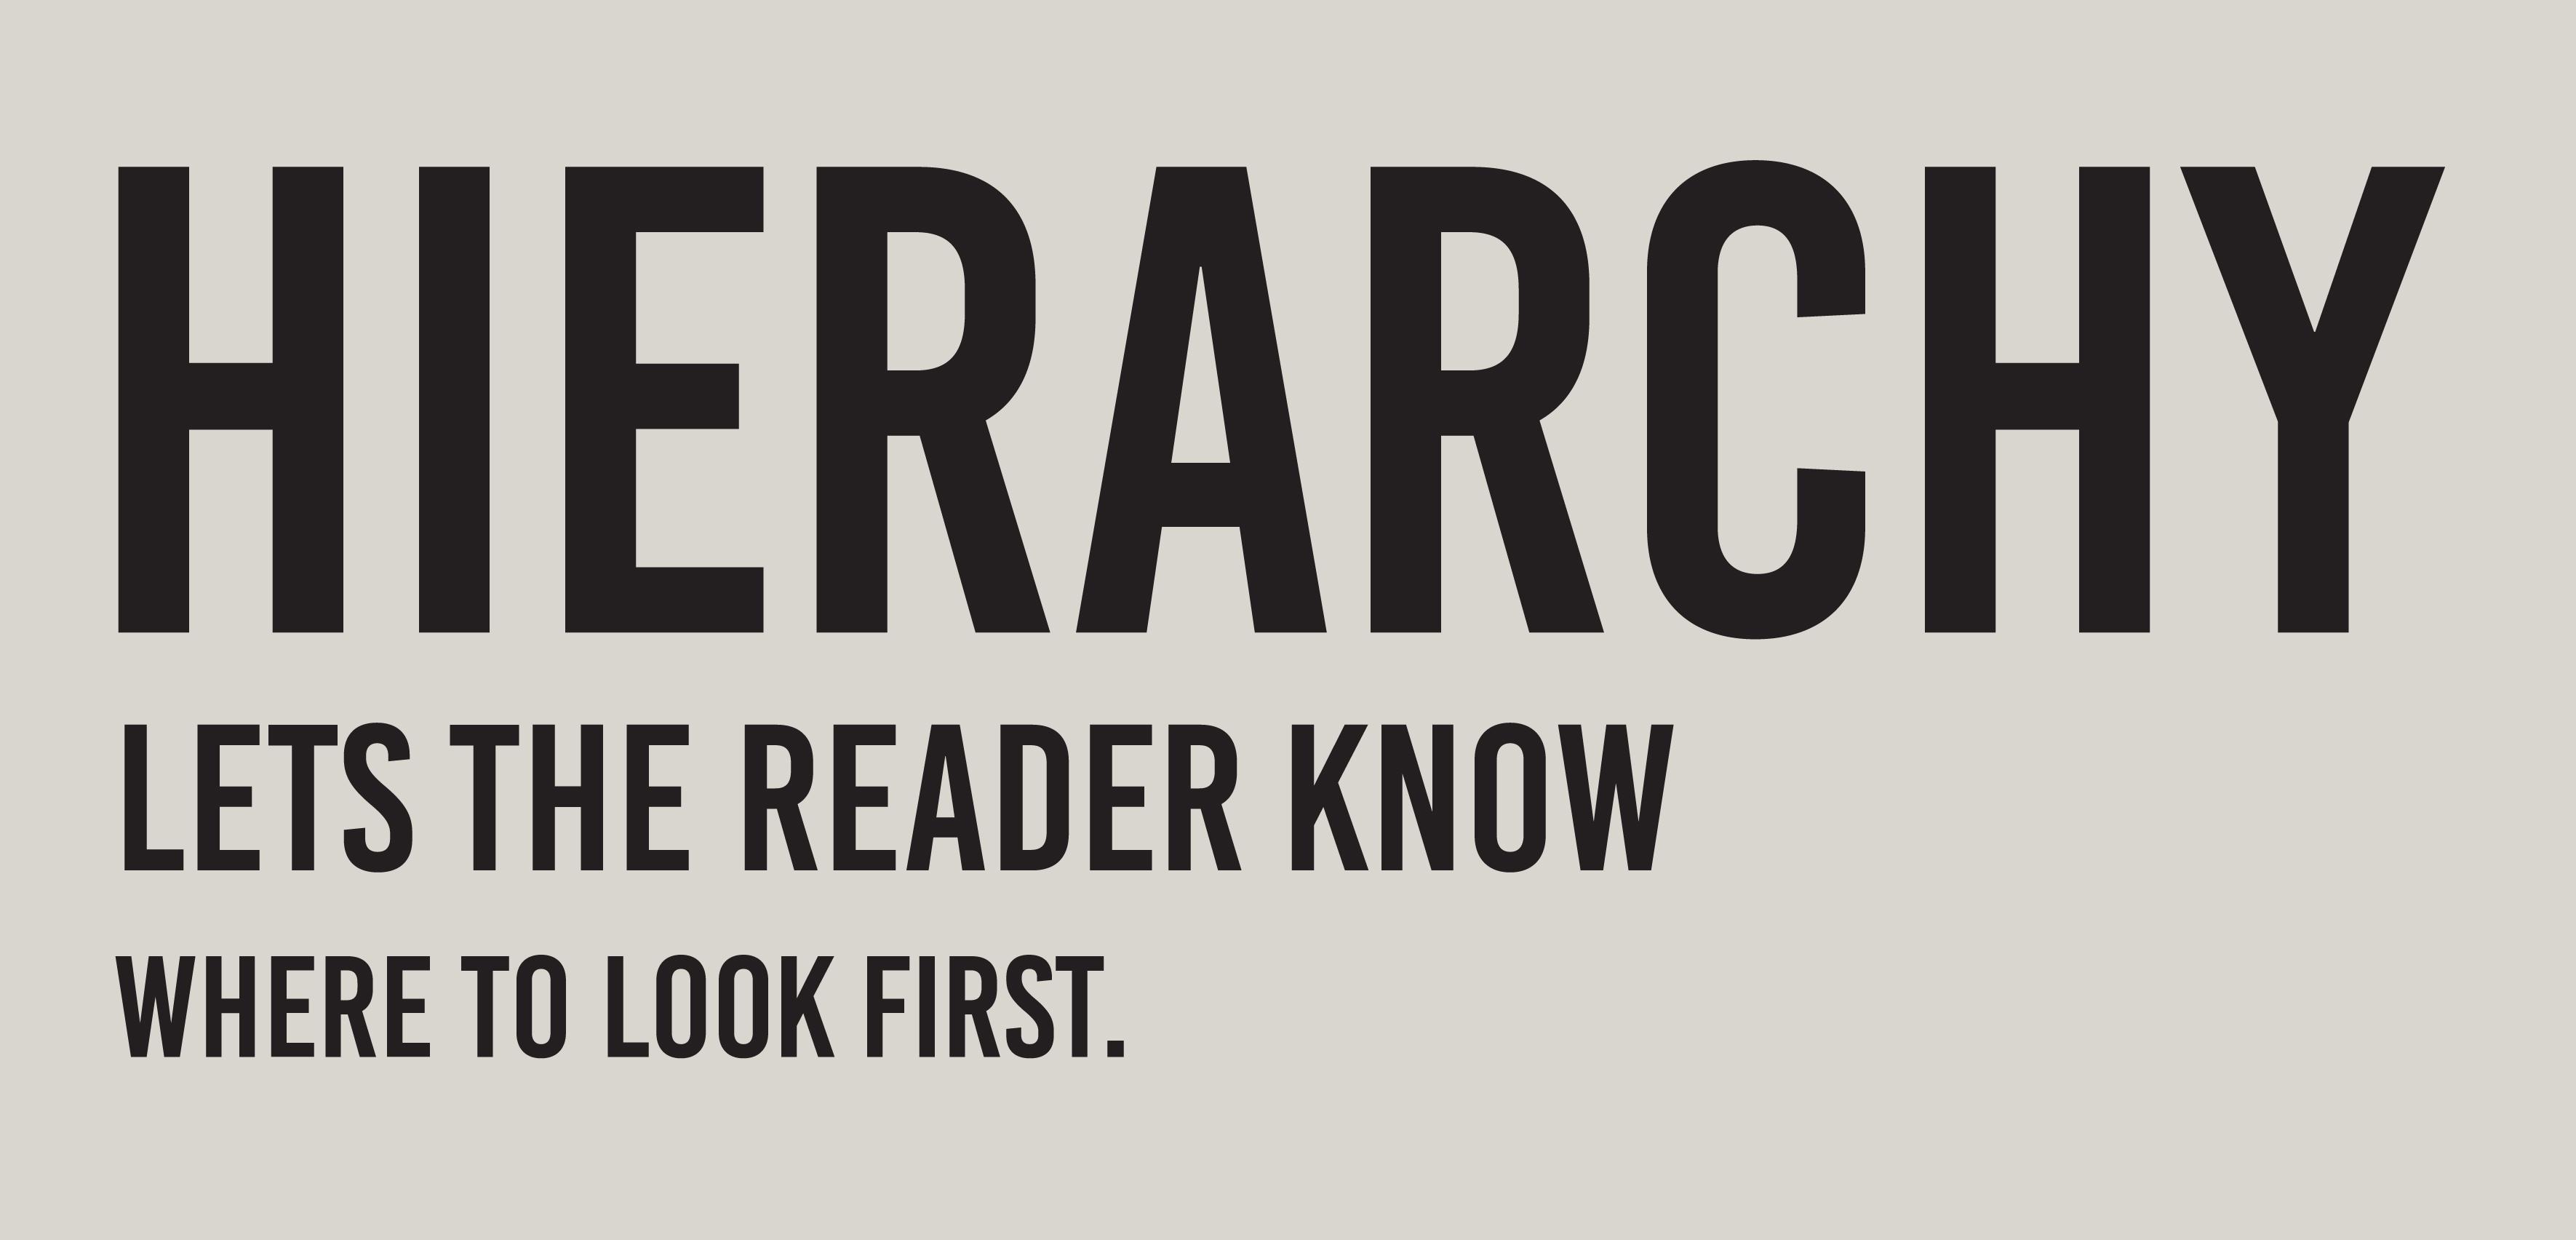 5 Typography Mistakes Every Beginner Makes Regarding